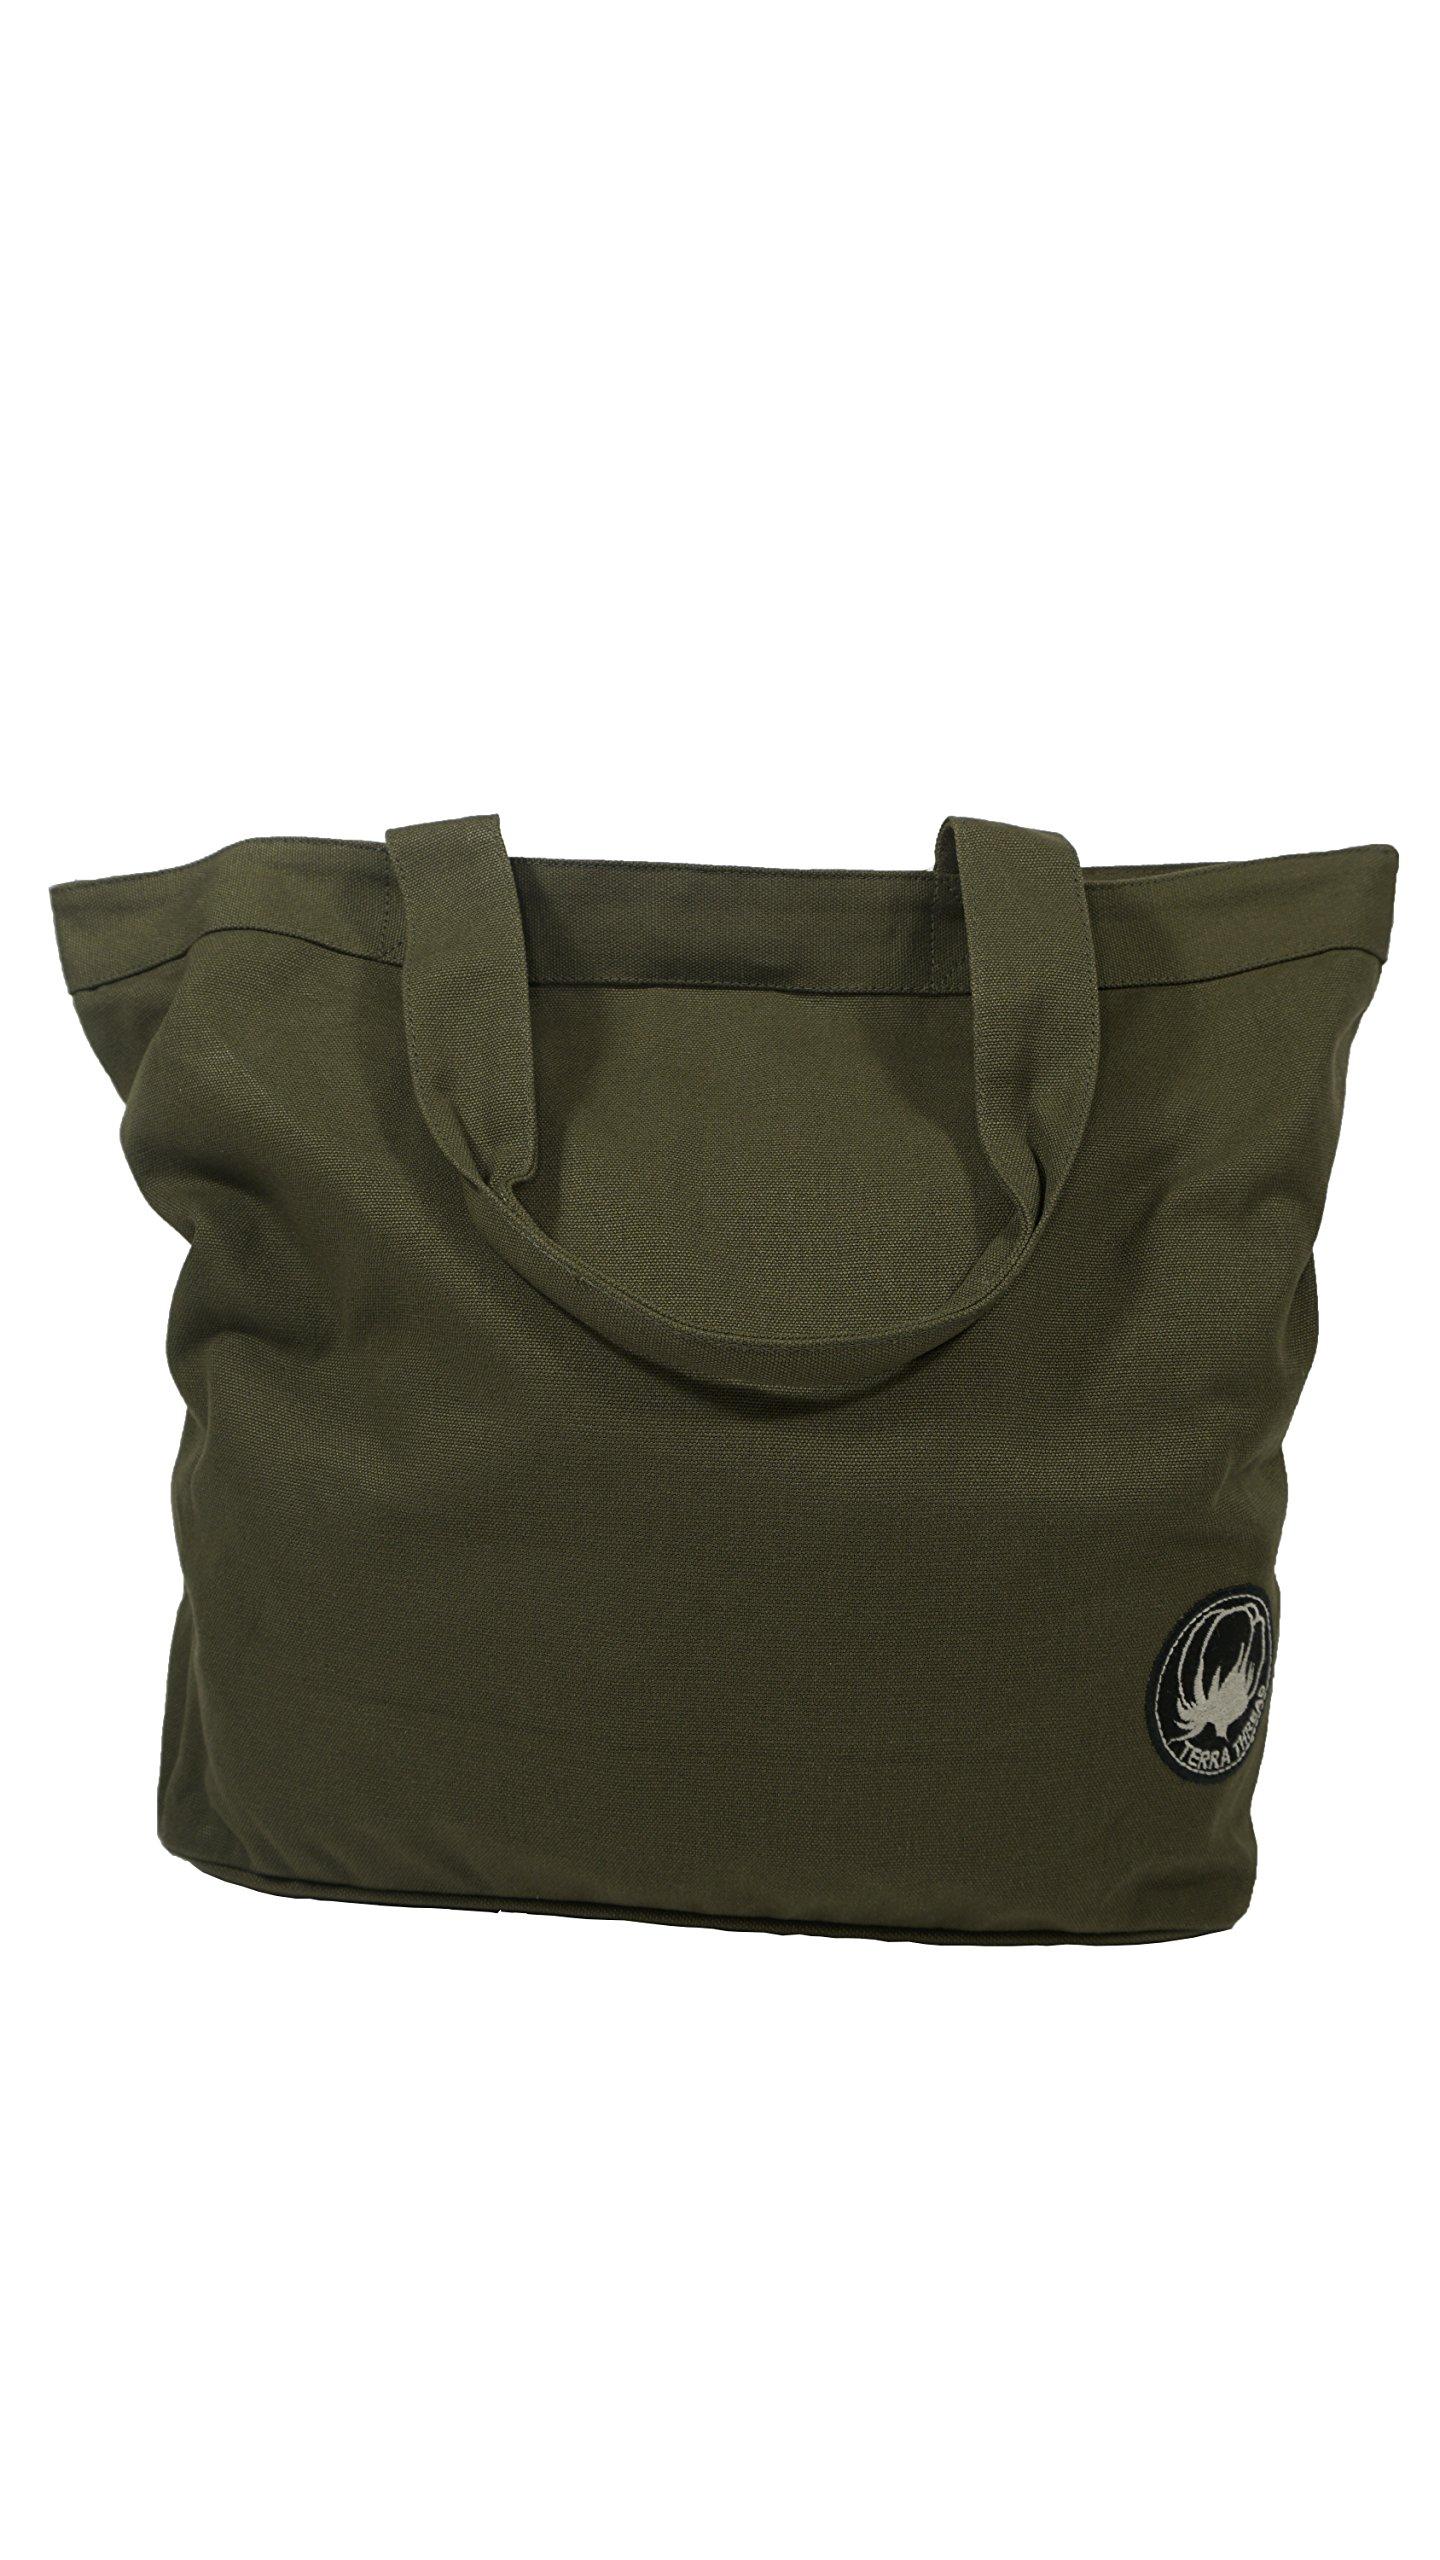 Organic Cotton Canvas Tote Bag. Shoulder Tote Bag. Work Tote. Weekend Bag.